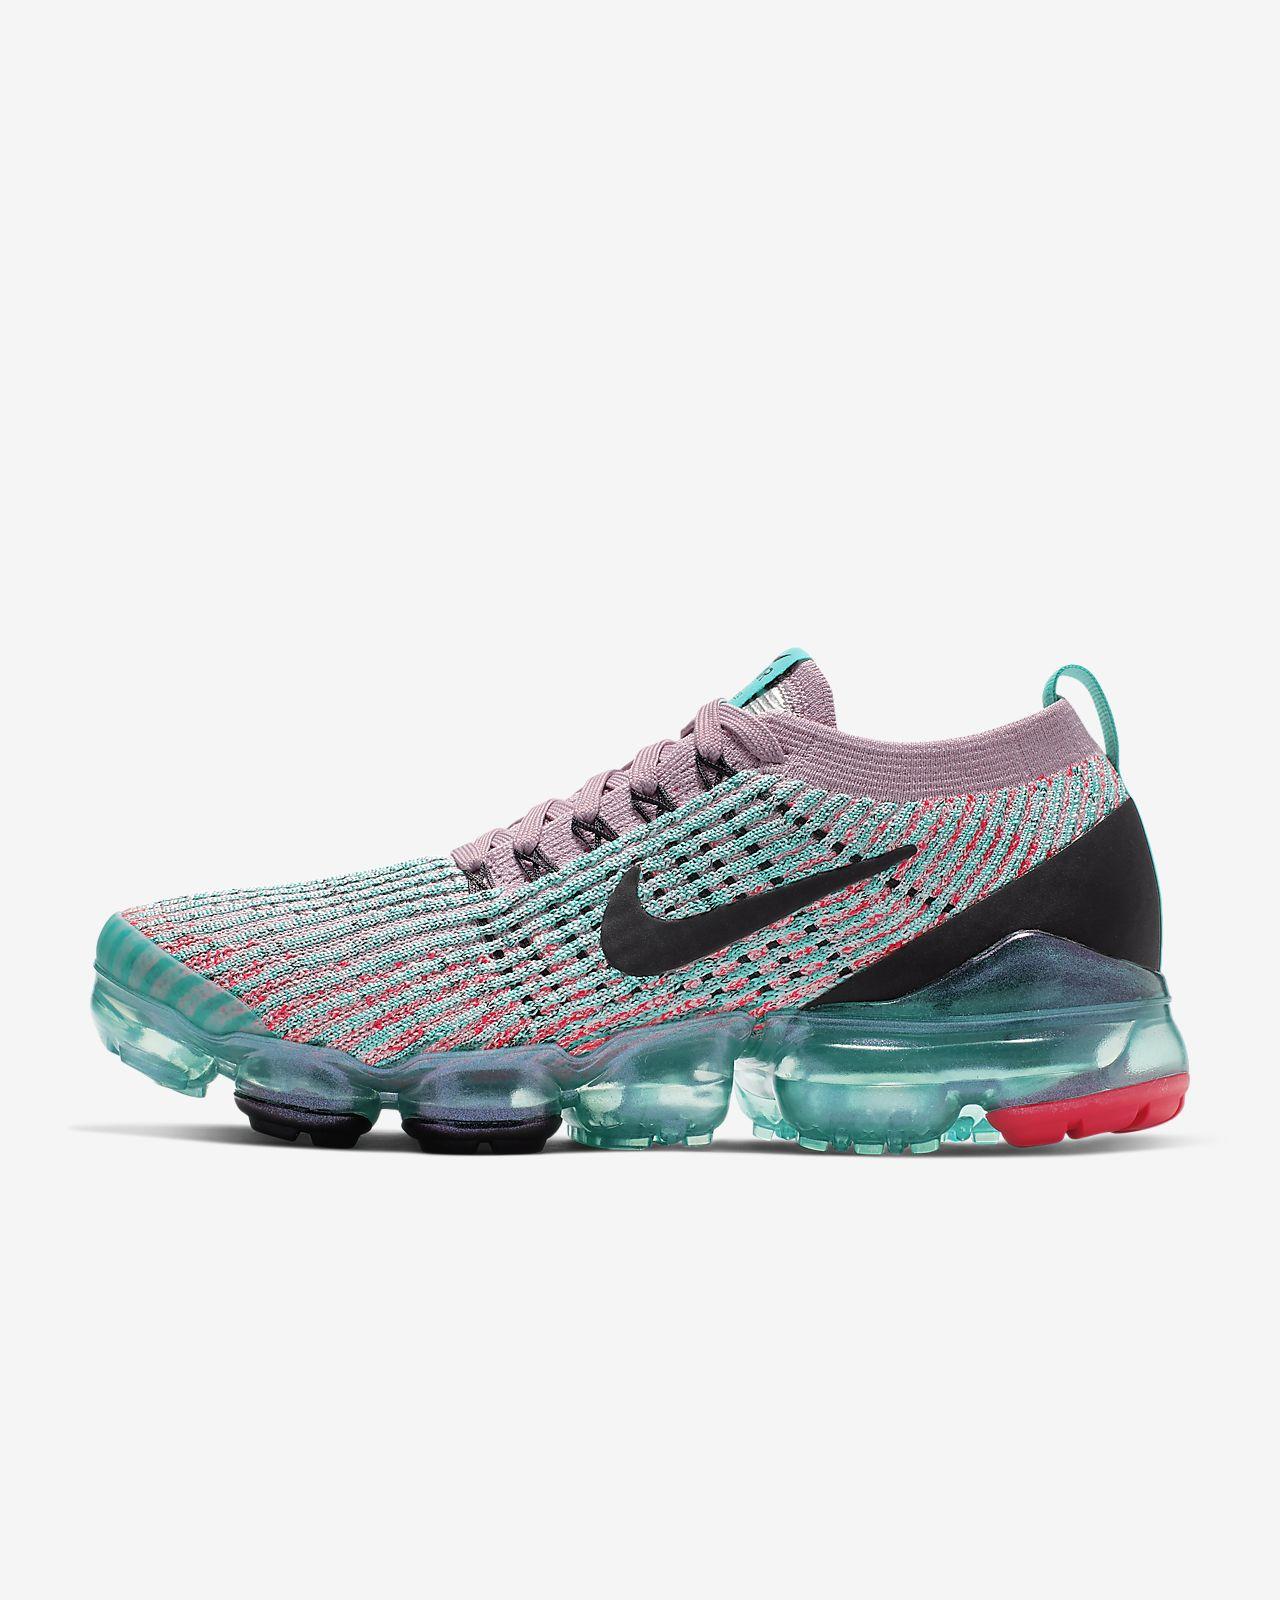 innovative design c1863 f58c4 ... Nike Air VaporMax Flyknit 3 Women s Shoe